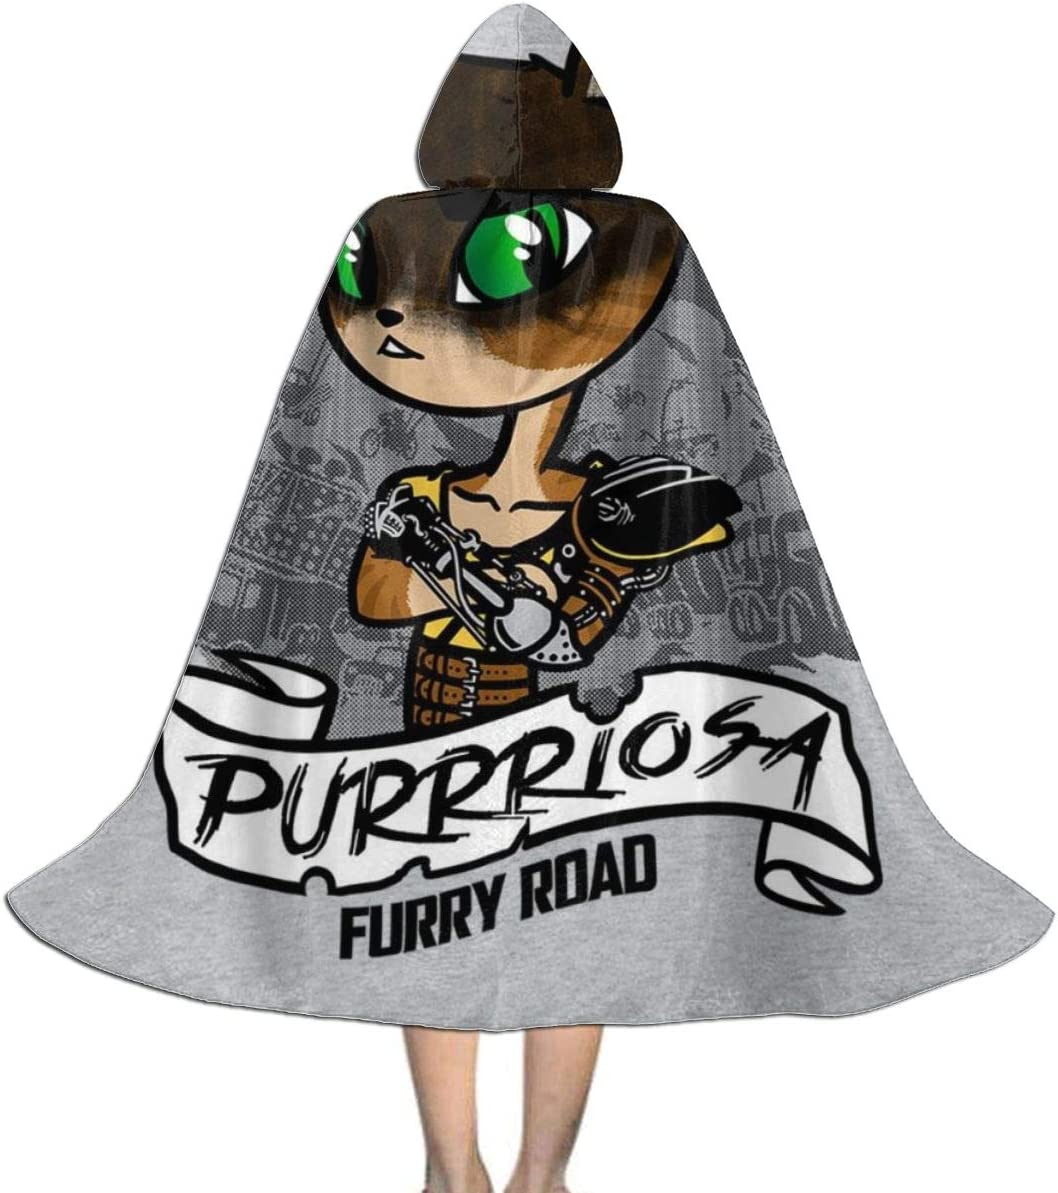 KUKHKU Mad MAX Furiosa Purriosa Capa con Capucha Unisex para niños ...